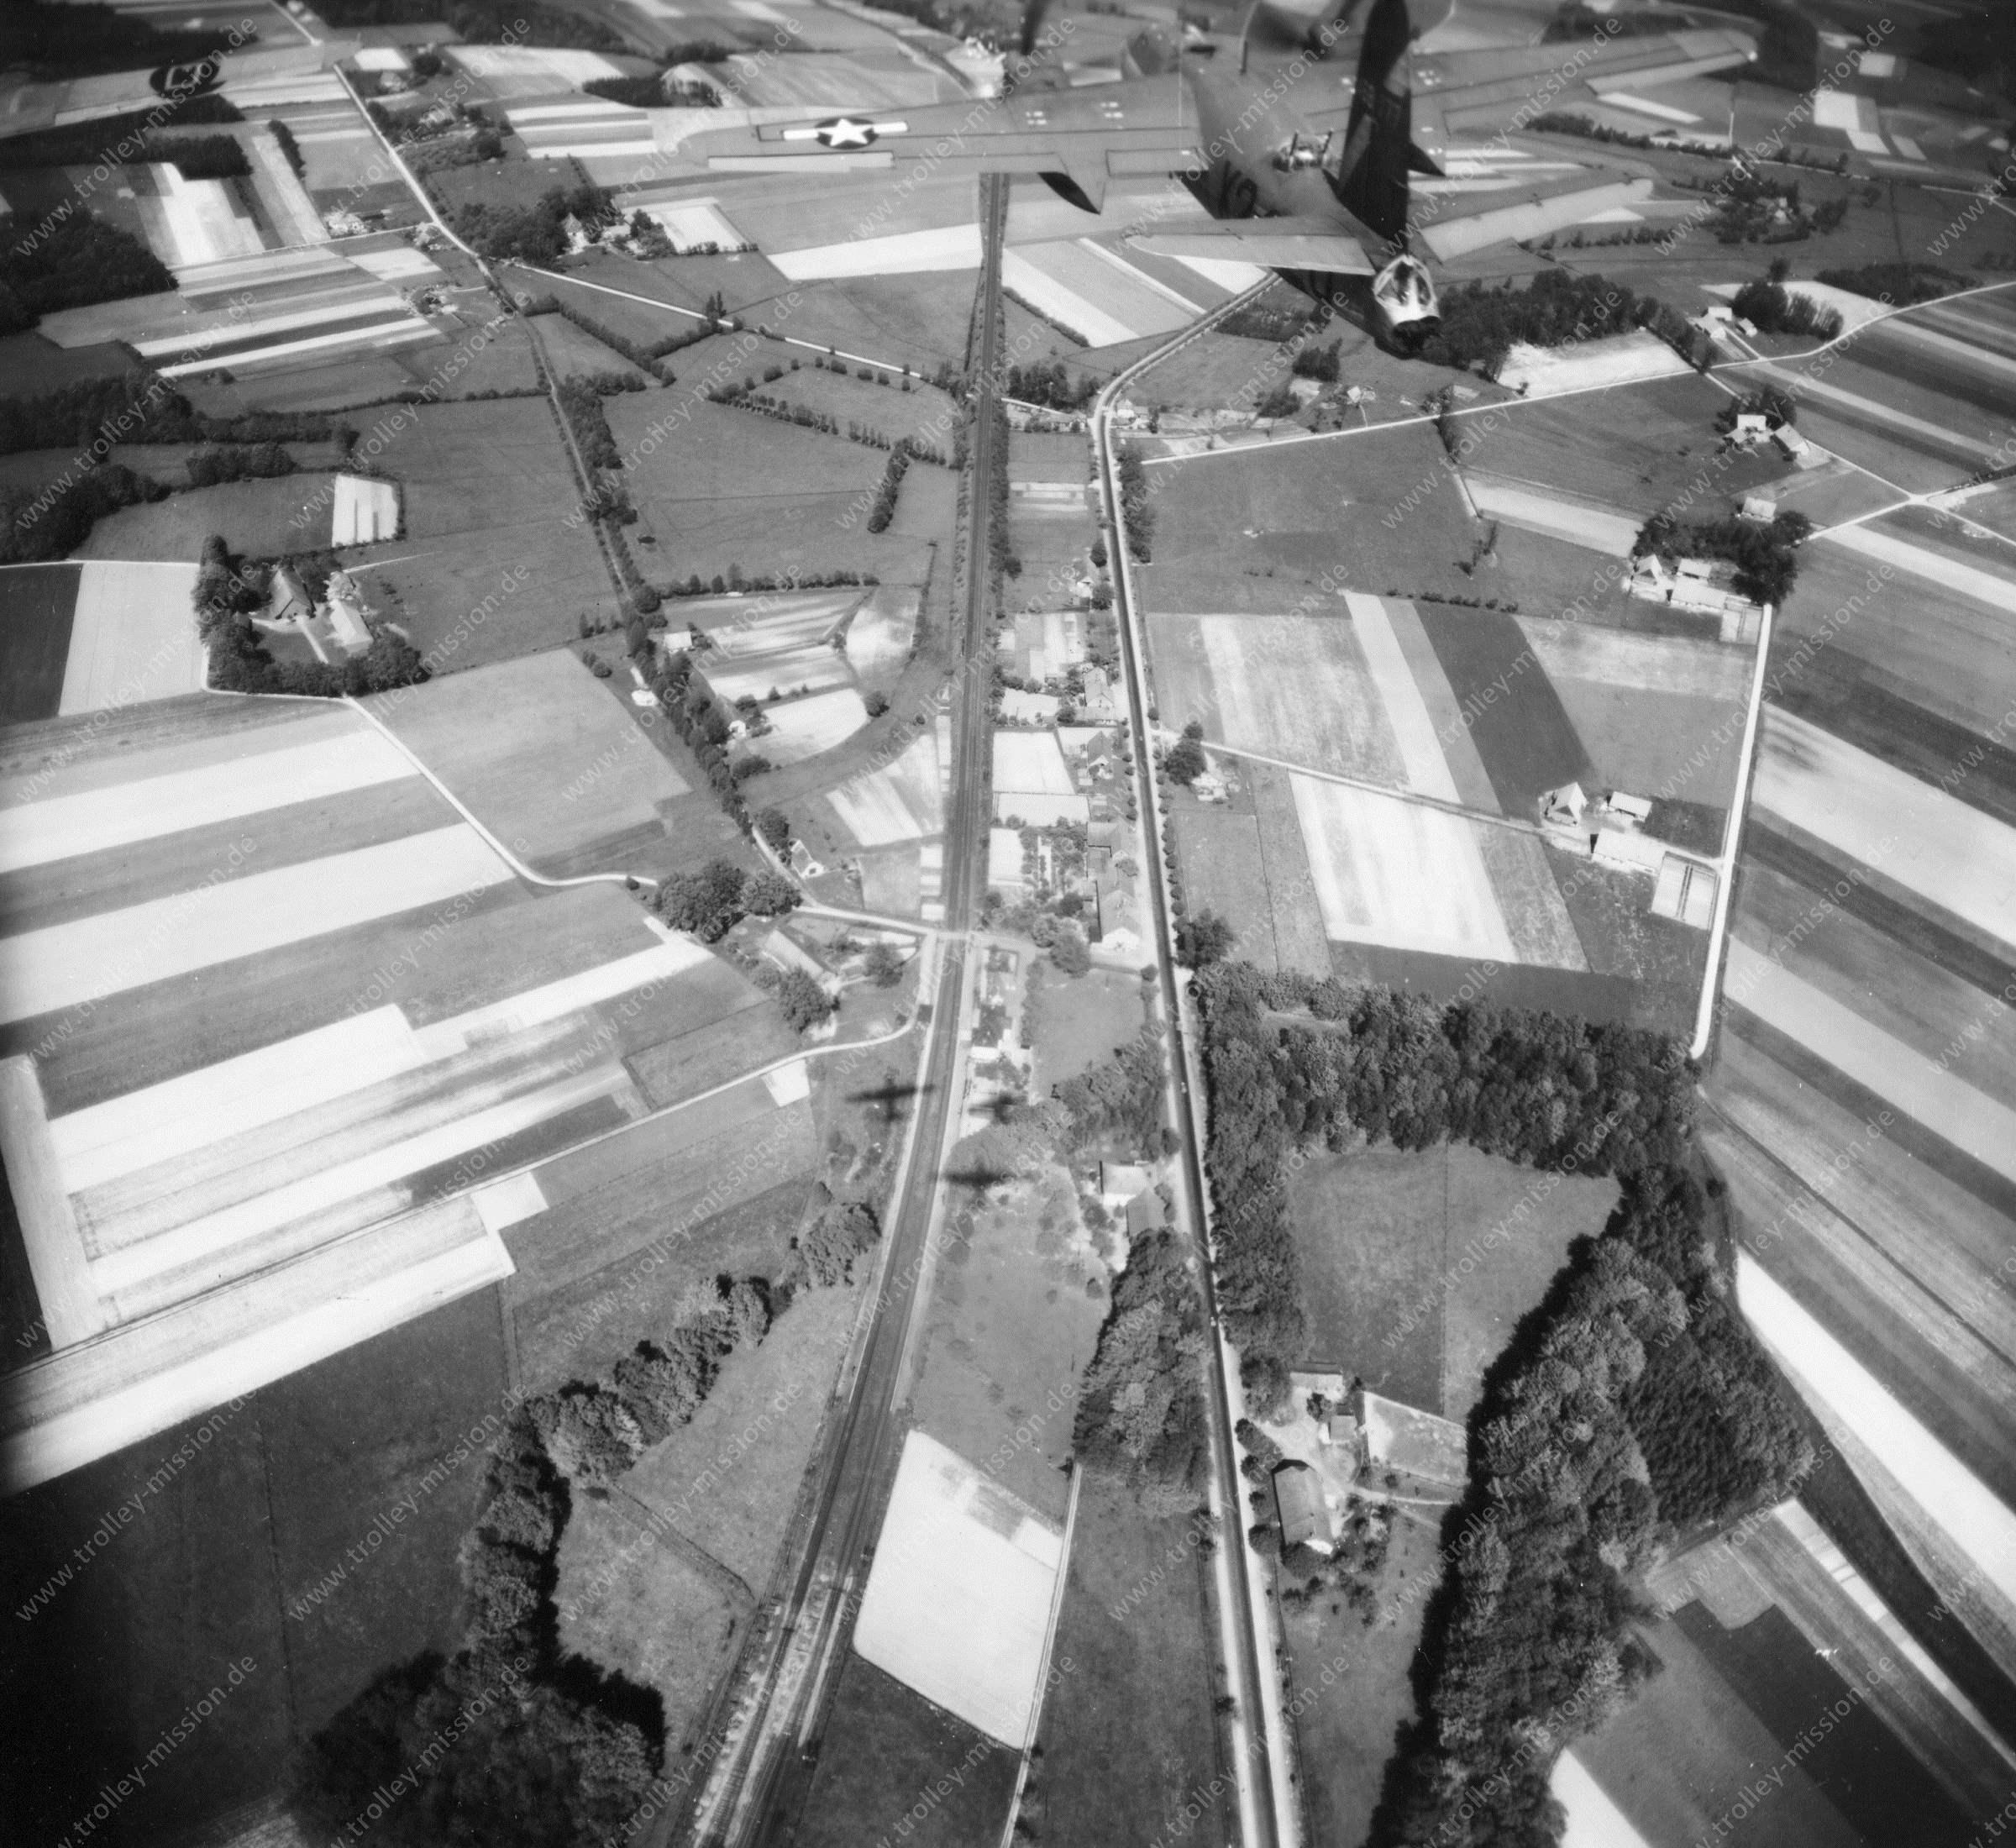 Osnabrück Luftbild Eisenbahngleise entlang der Bremer Straße in Belm